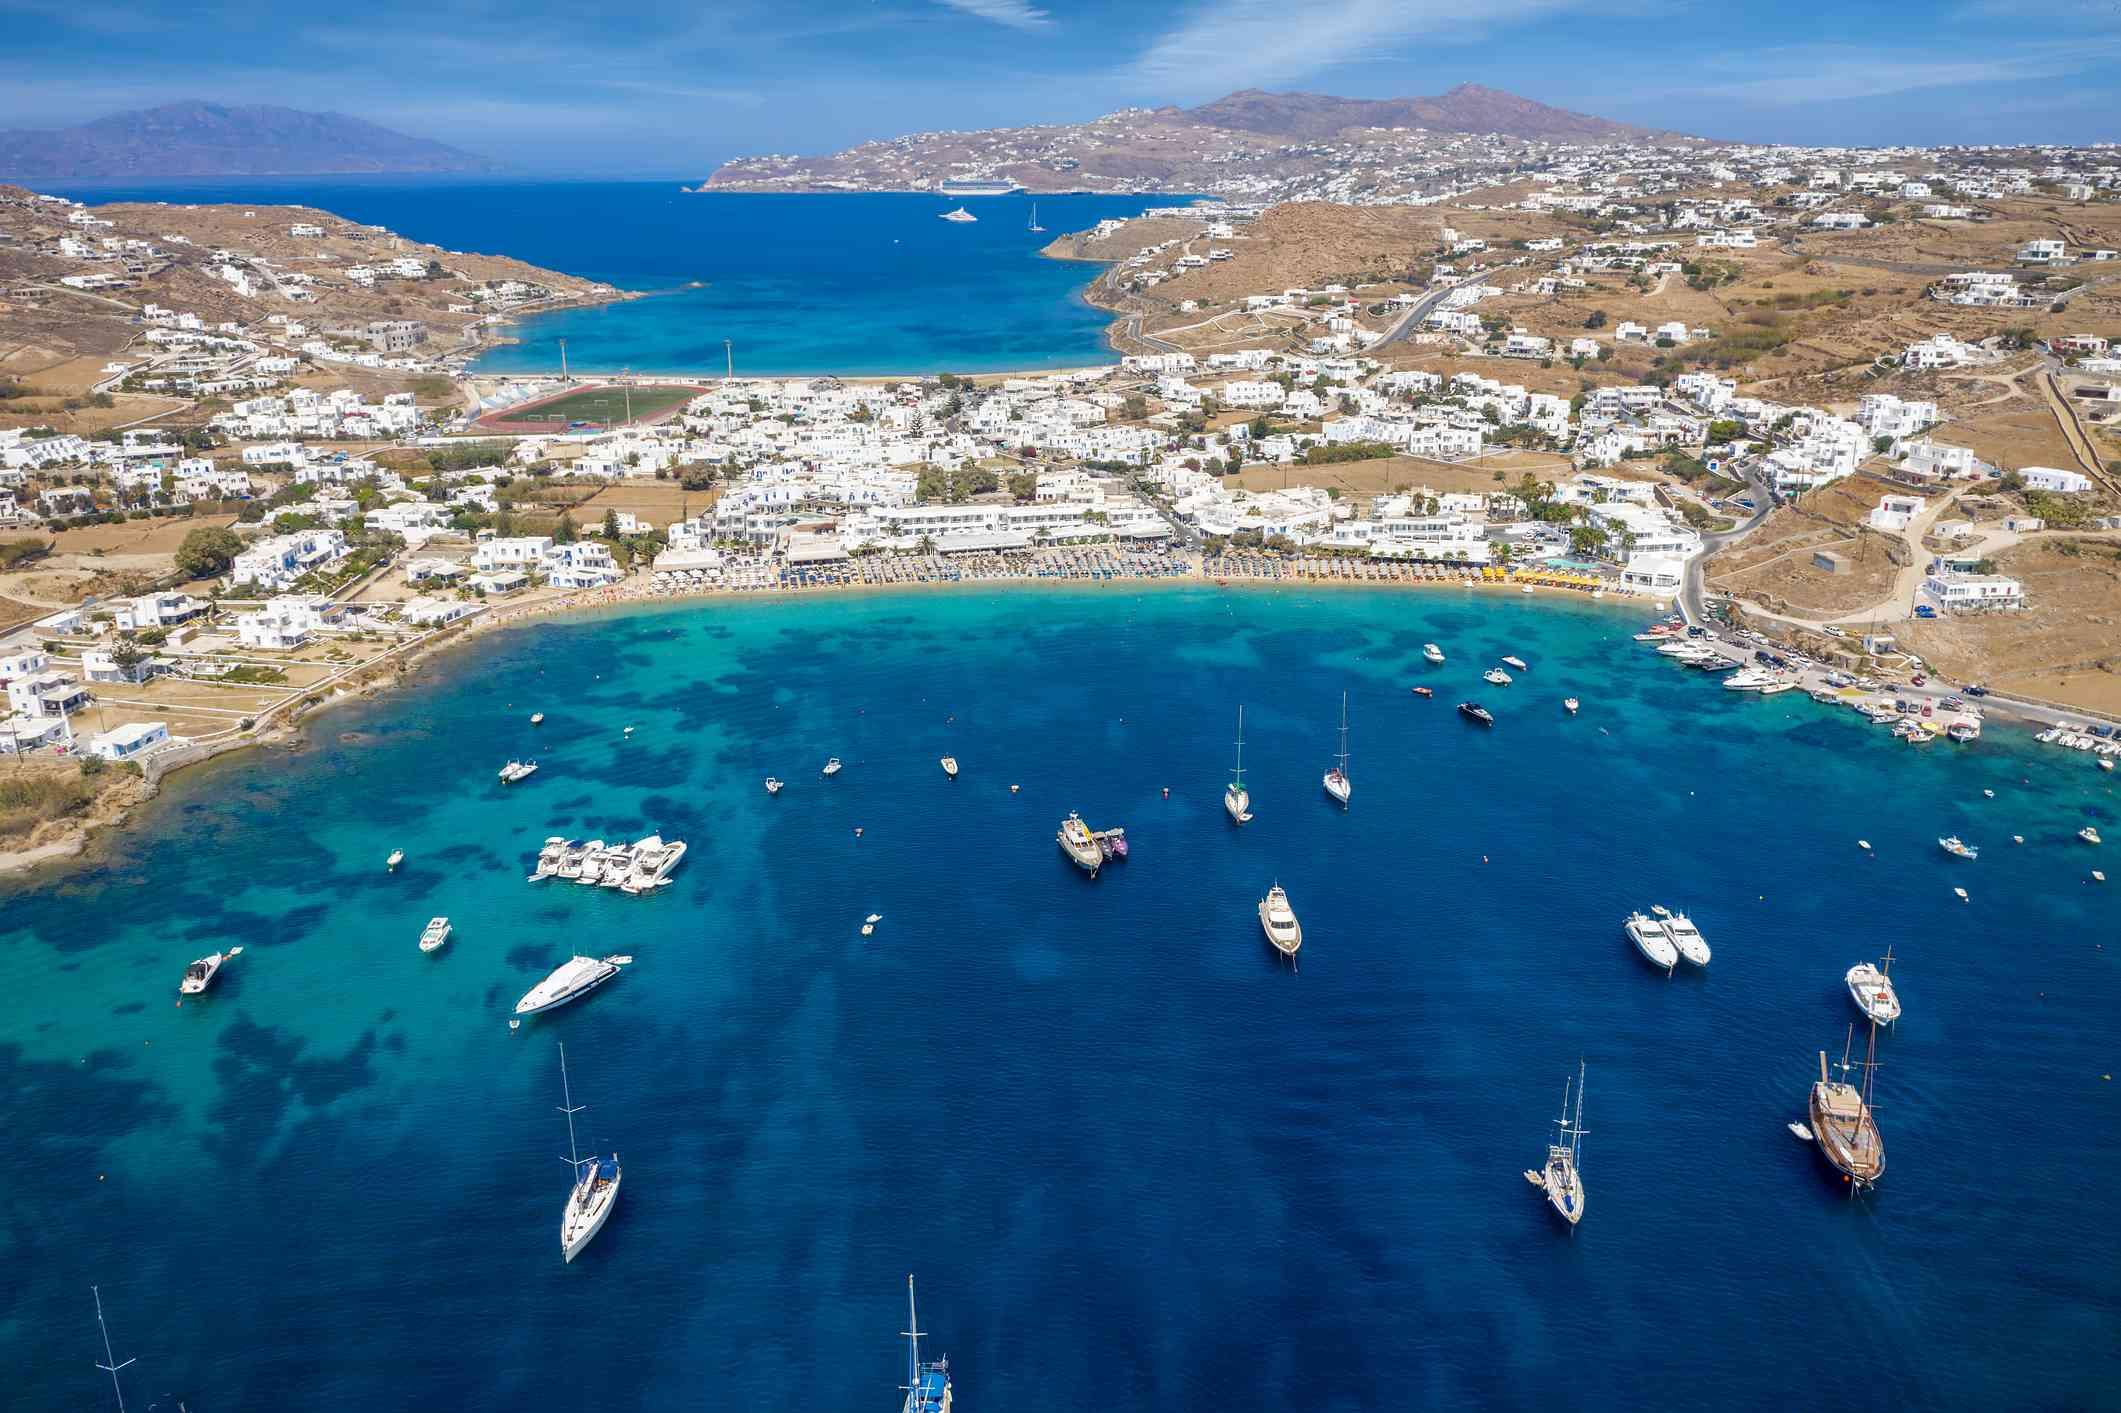 Aerial view of Ornos beach on the island of Mykonos